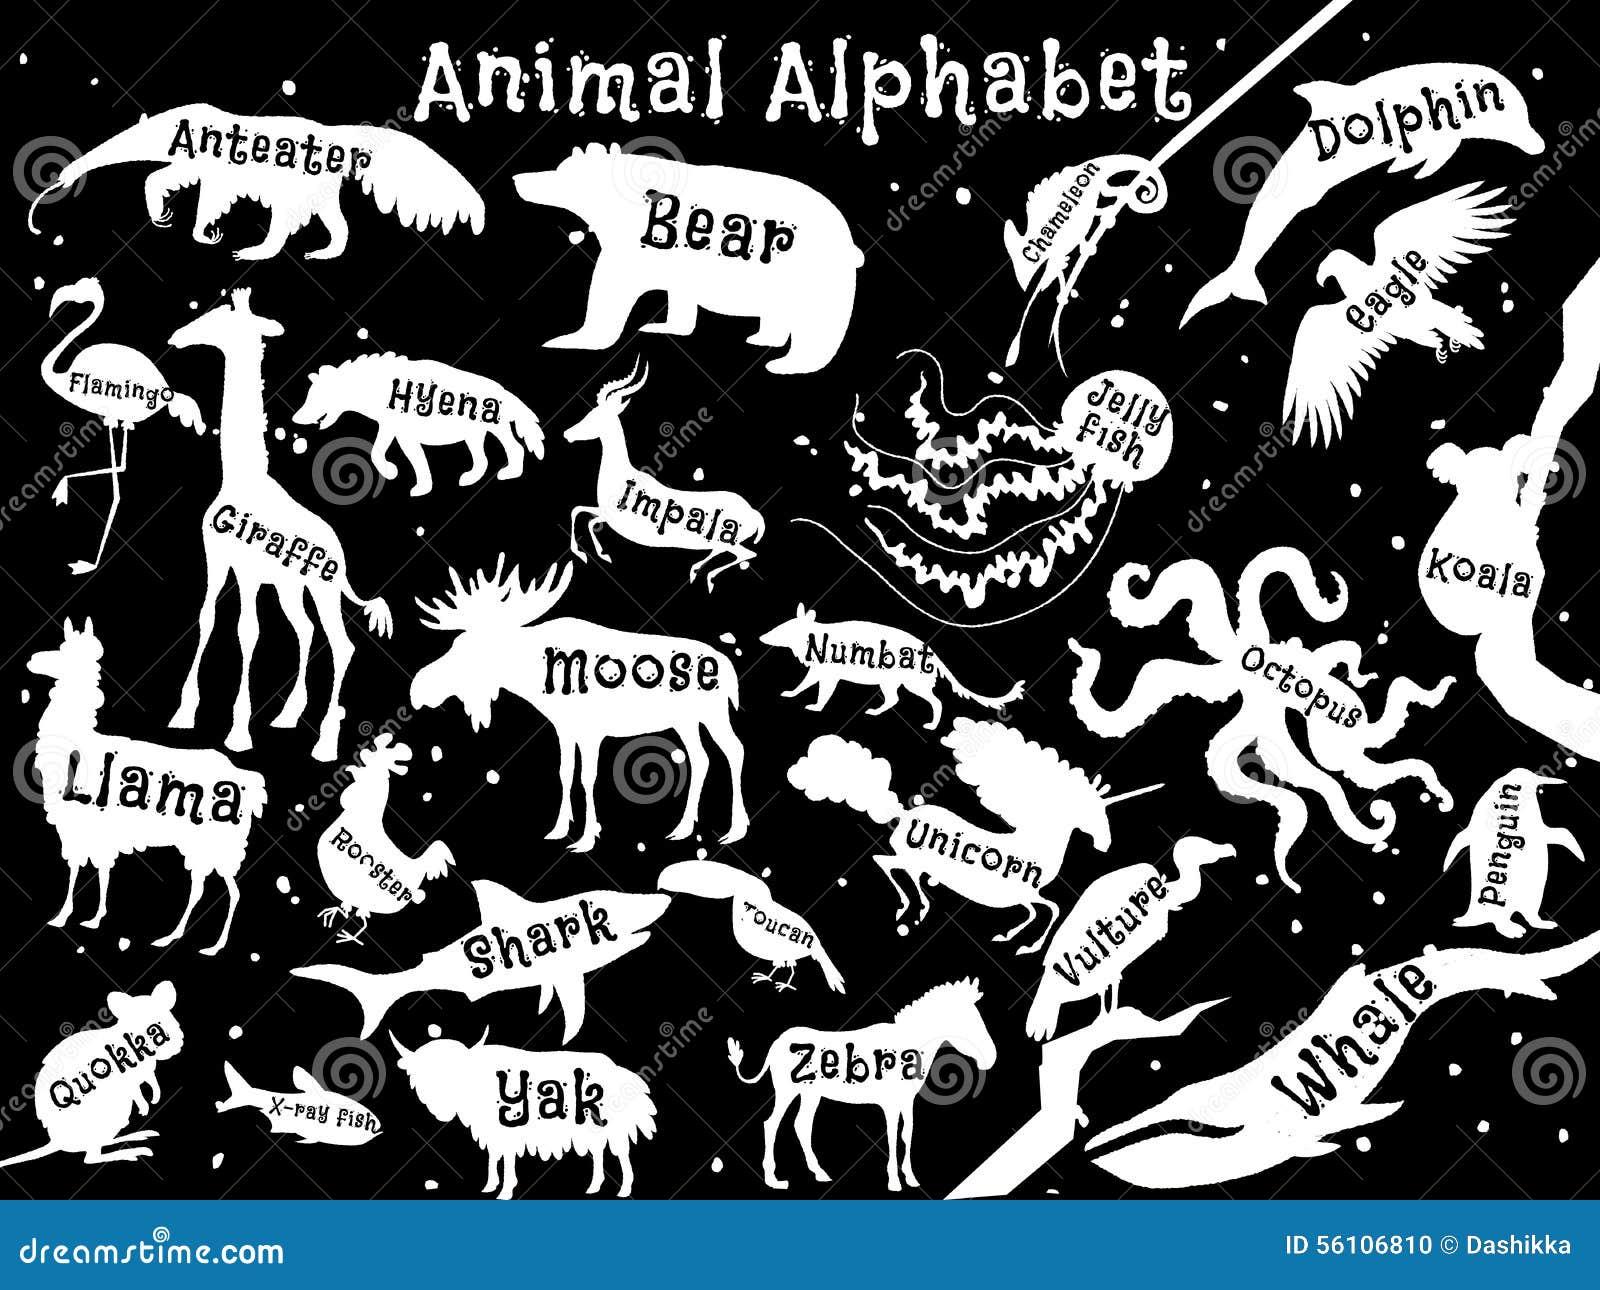 Download Animal Alphabet Poster For Children Animals Stock Vector